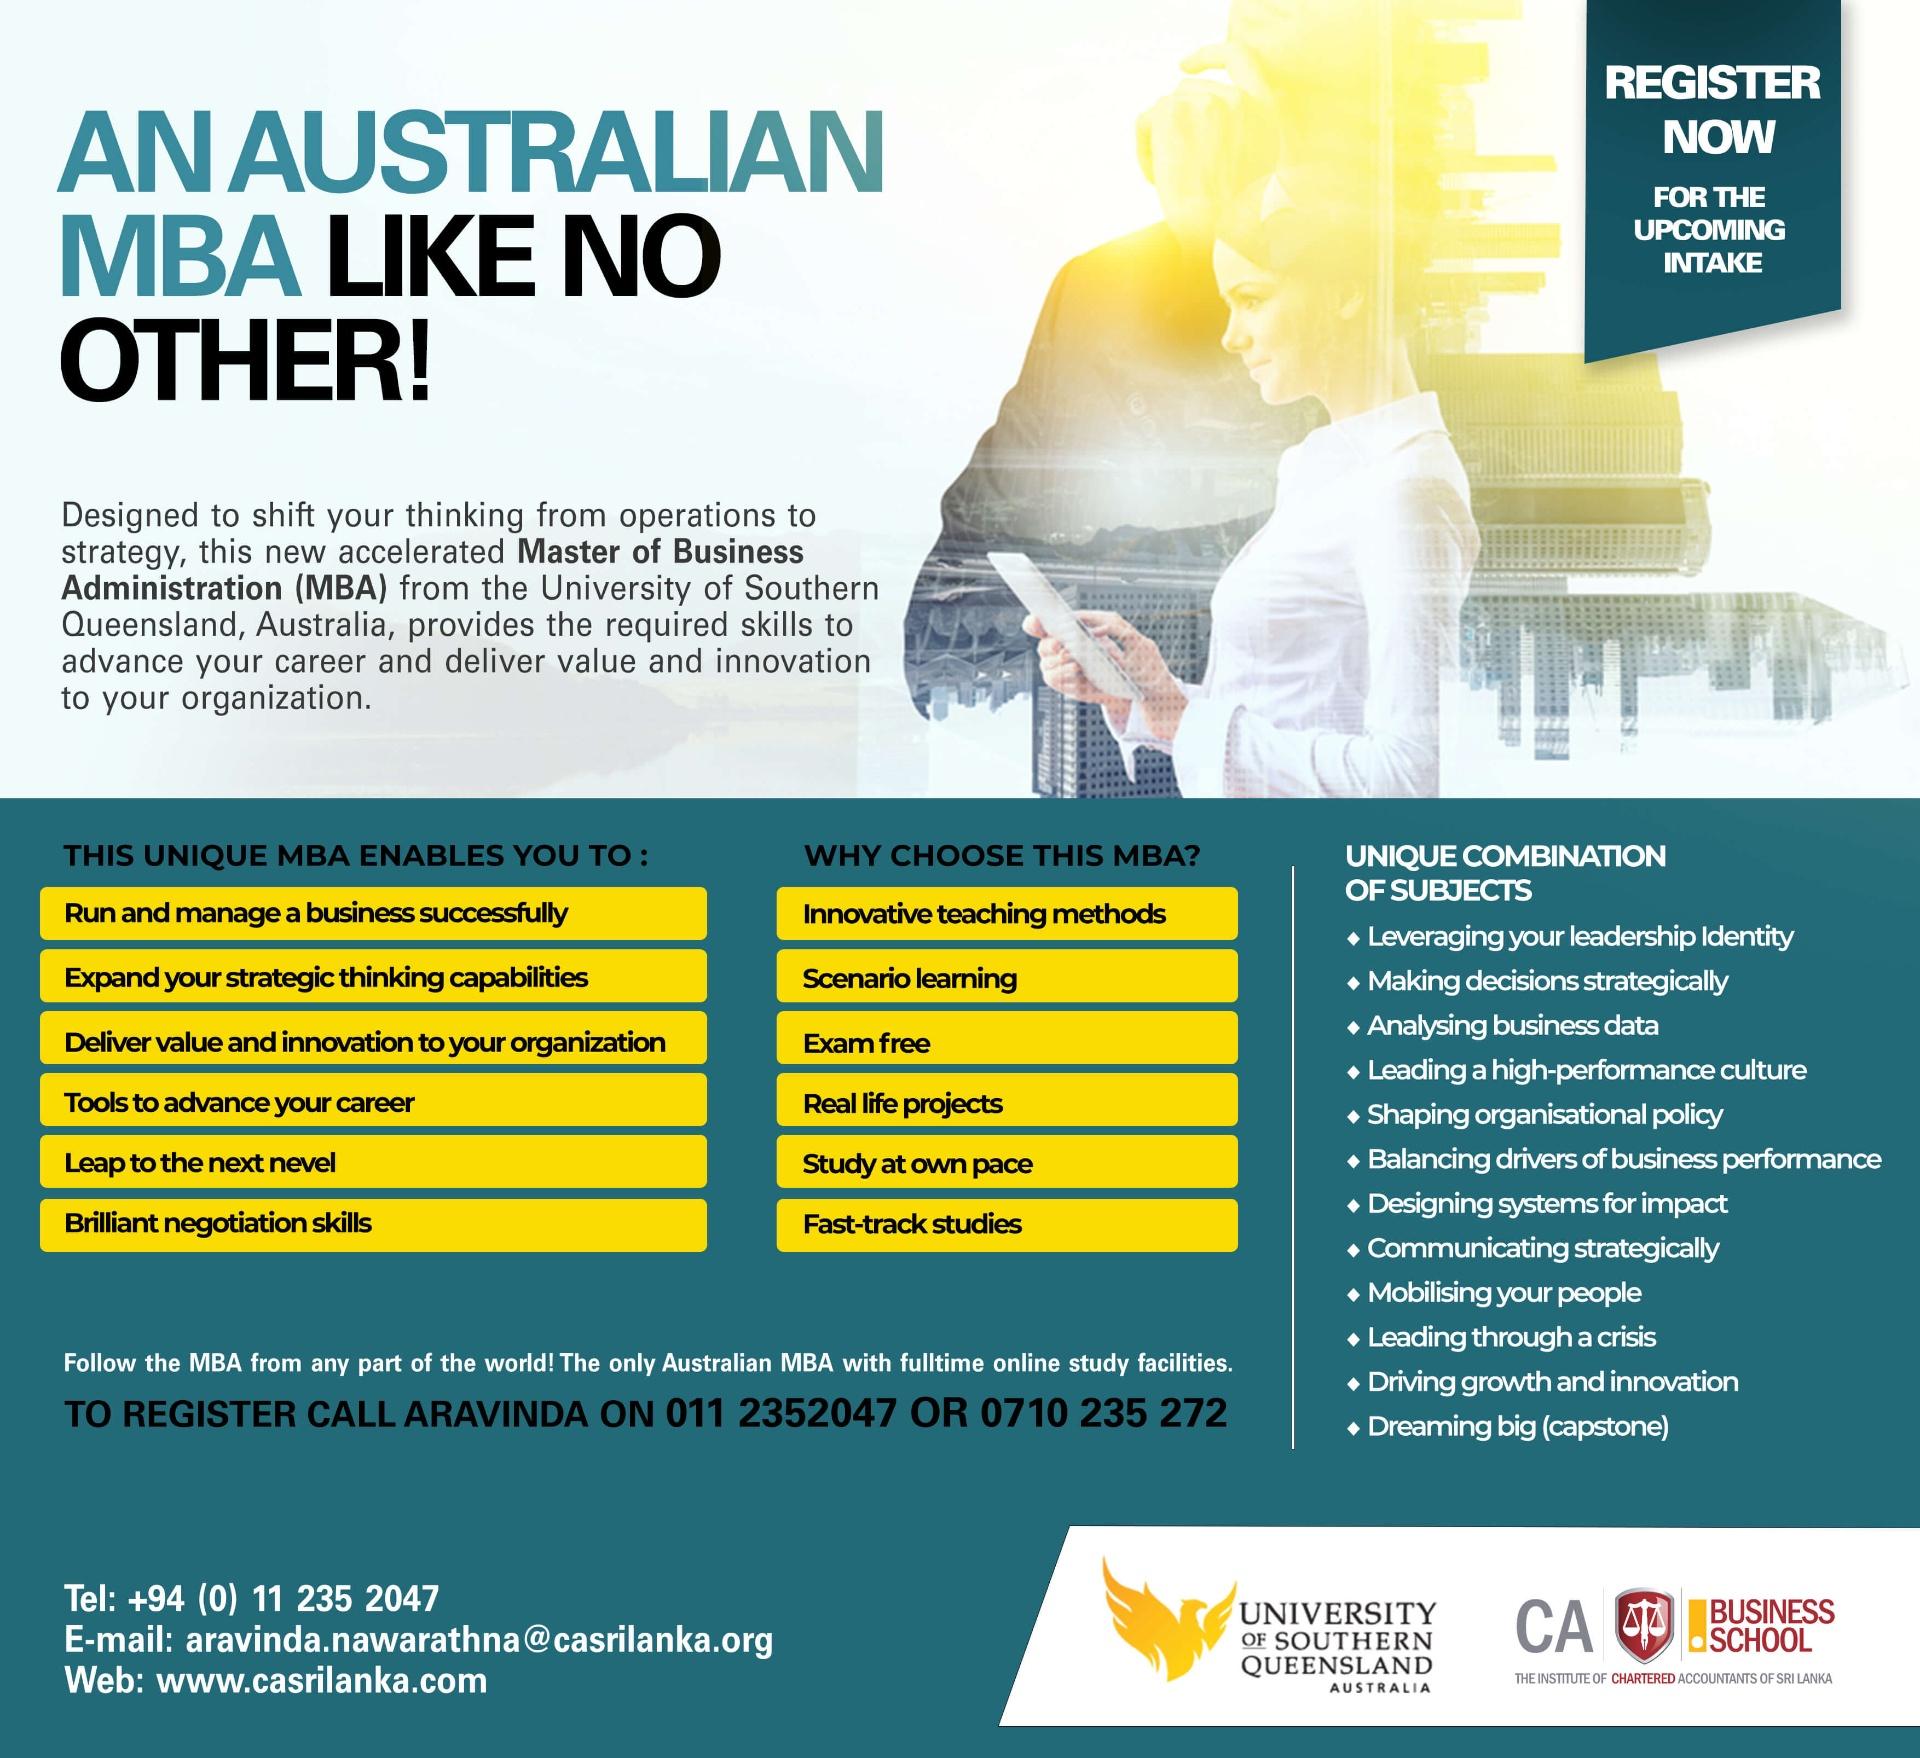 An Australian MBA Like No Other